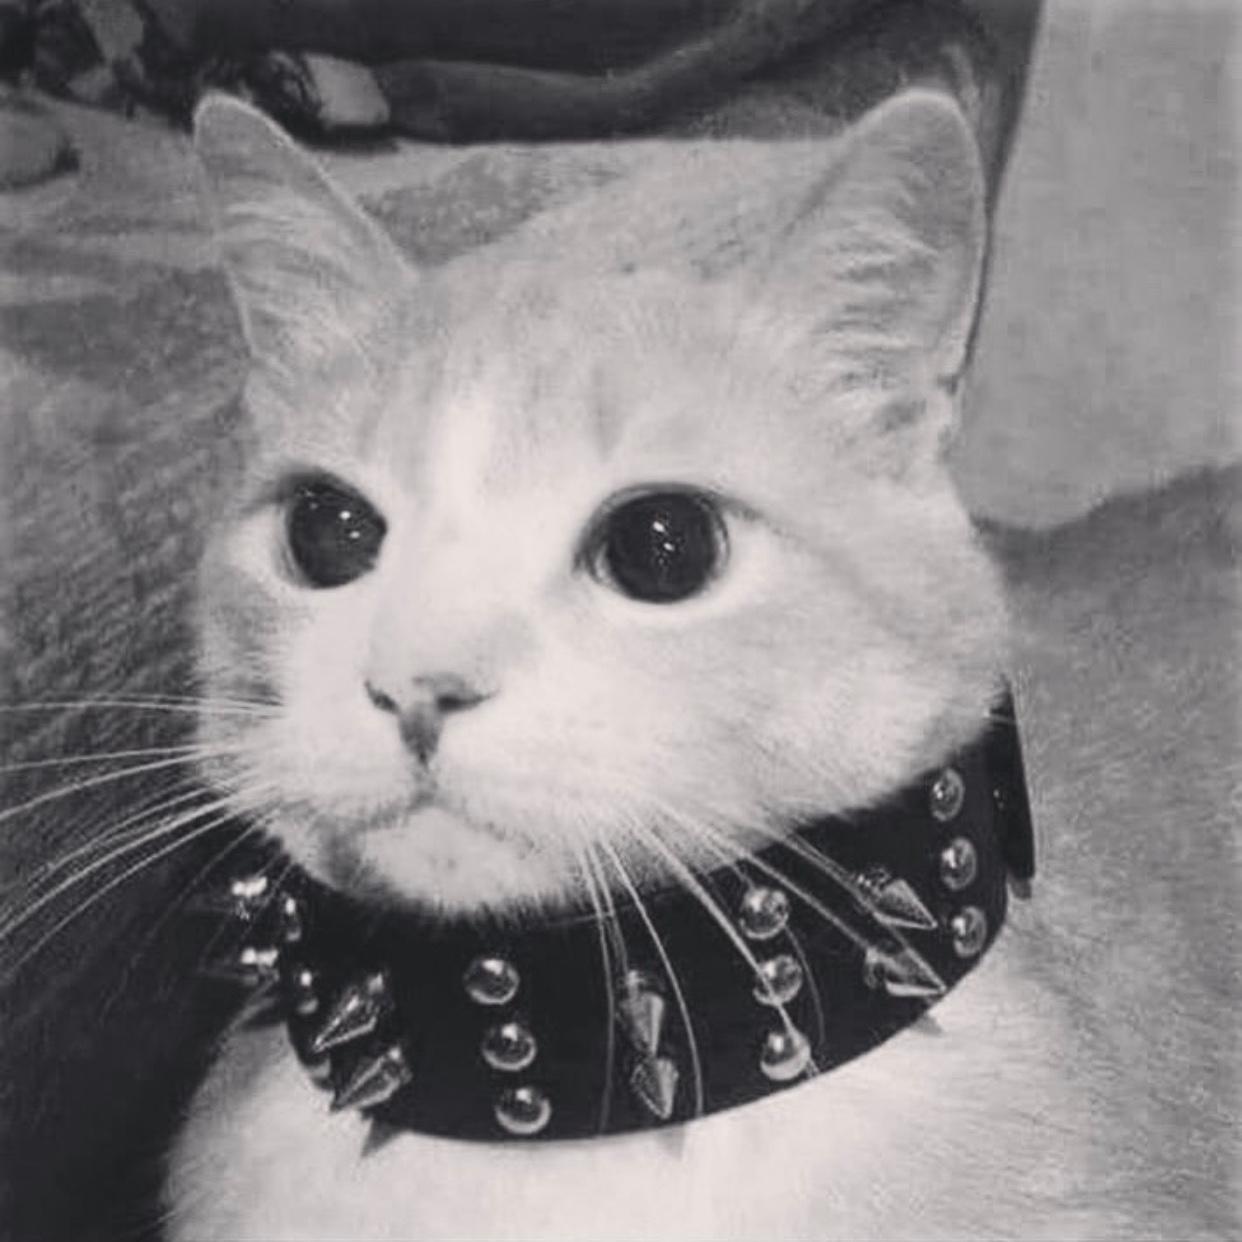 Knife Cat Meme Transparent